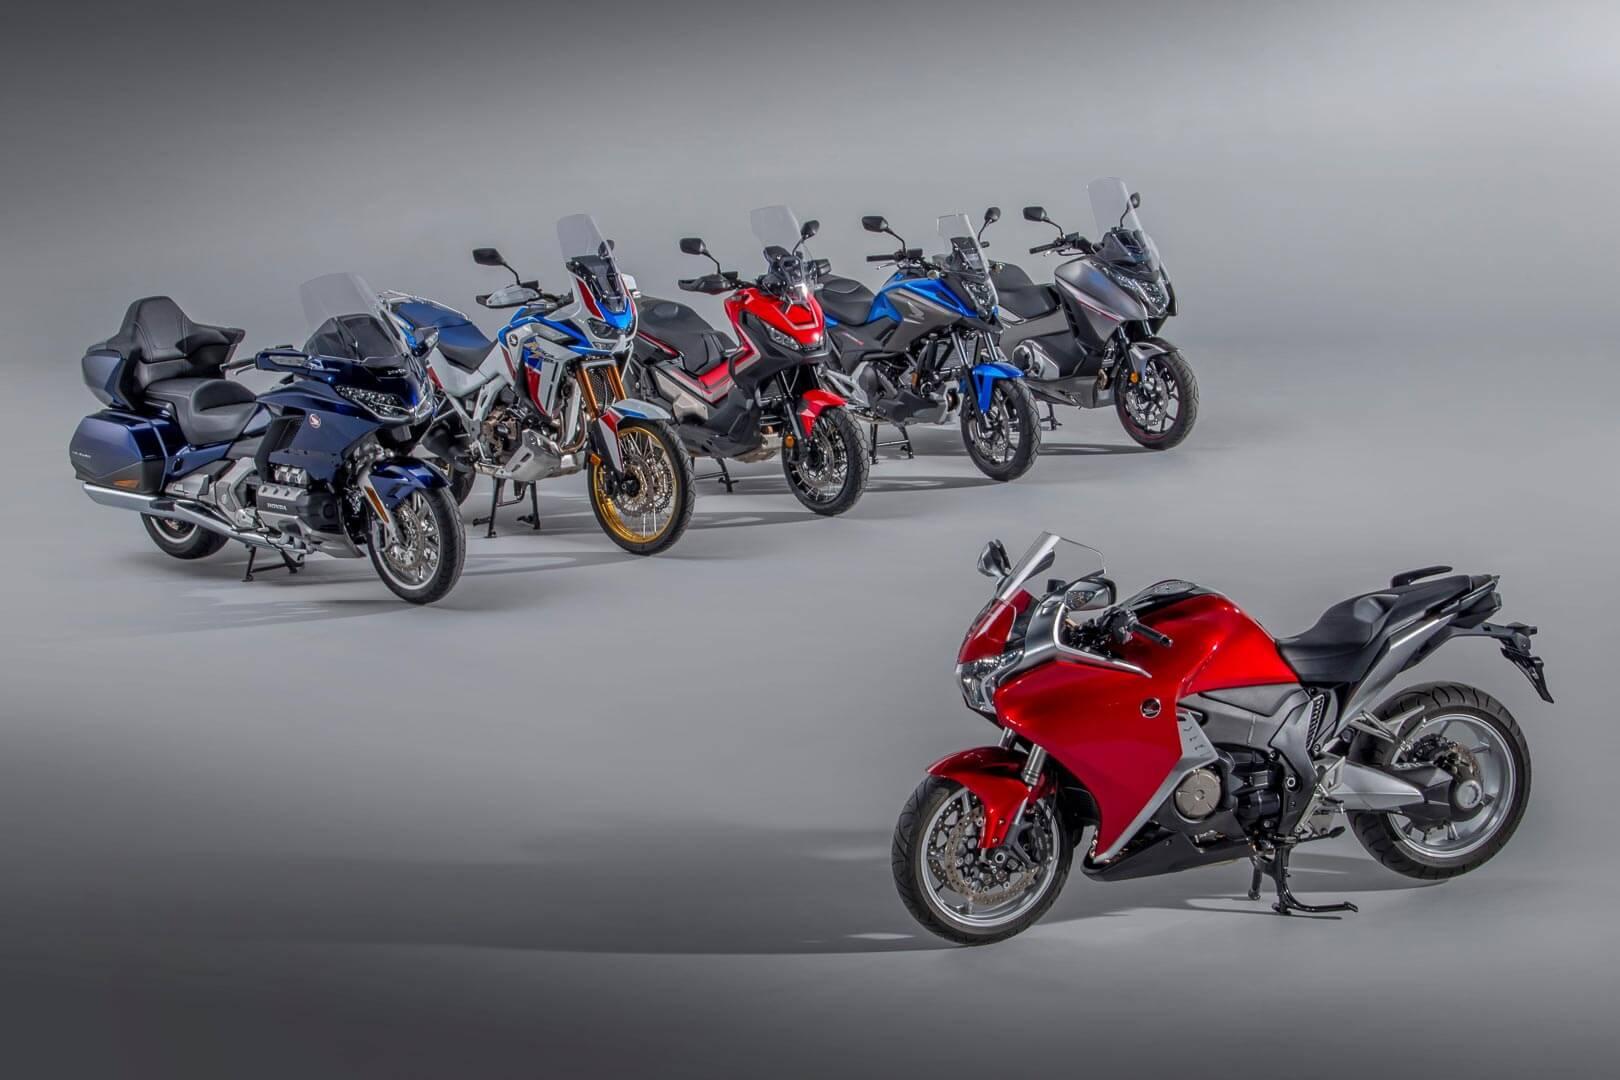 Honda DCT Automatic Transmission for Motorcycles & ATV & SxS / UTV PowerSprots